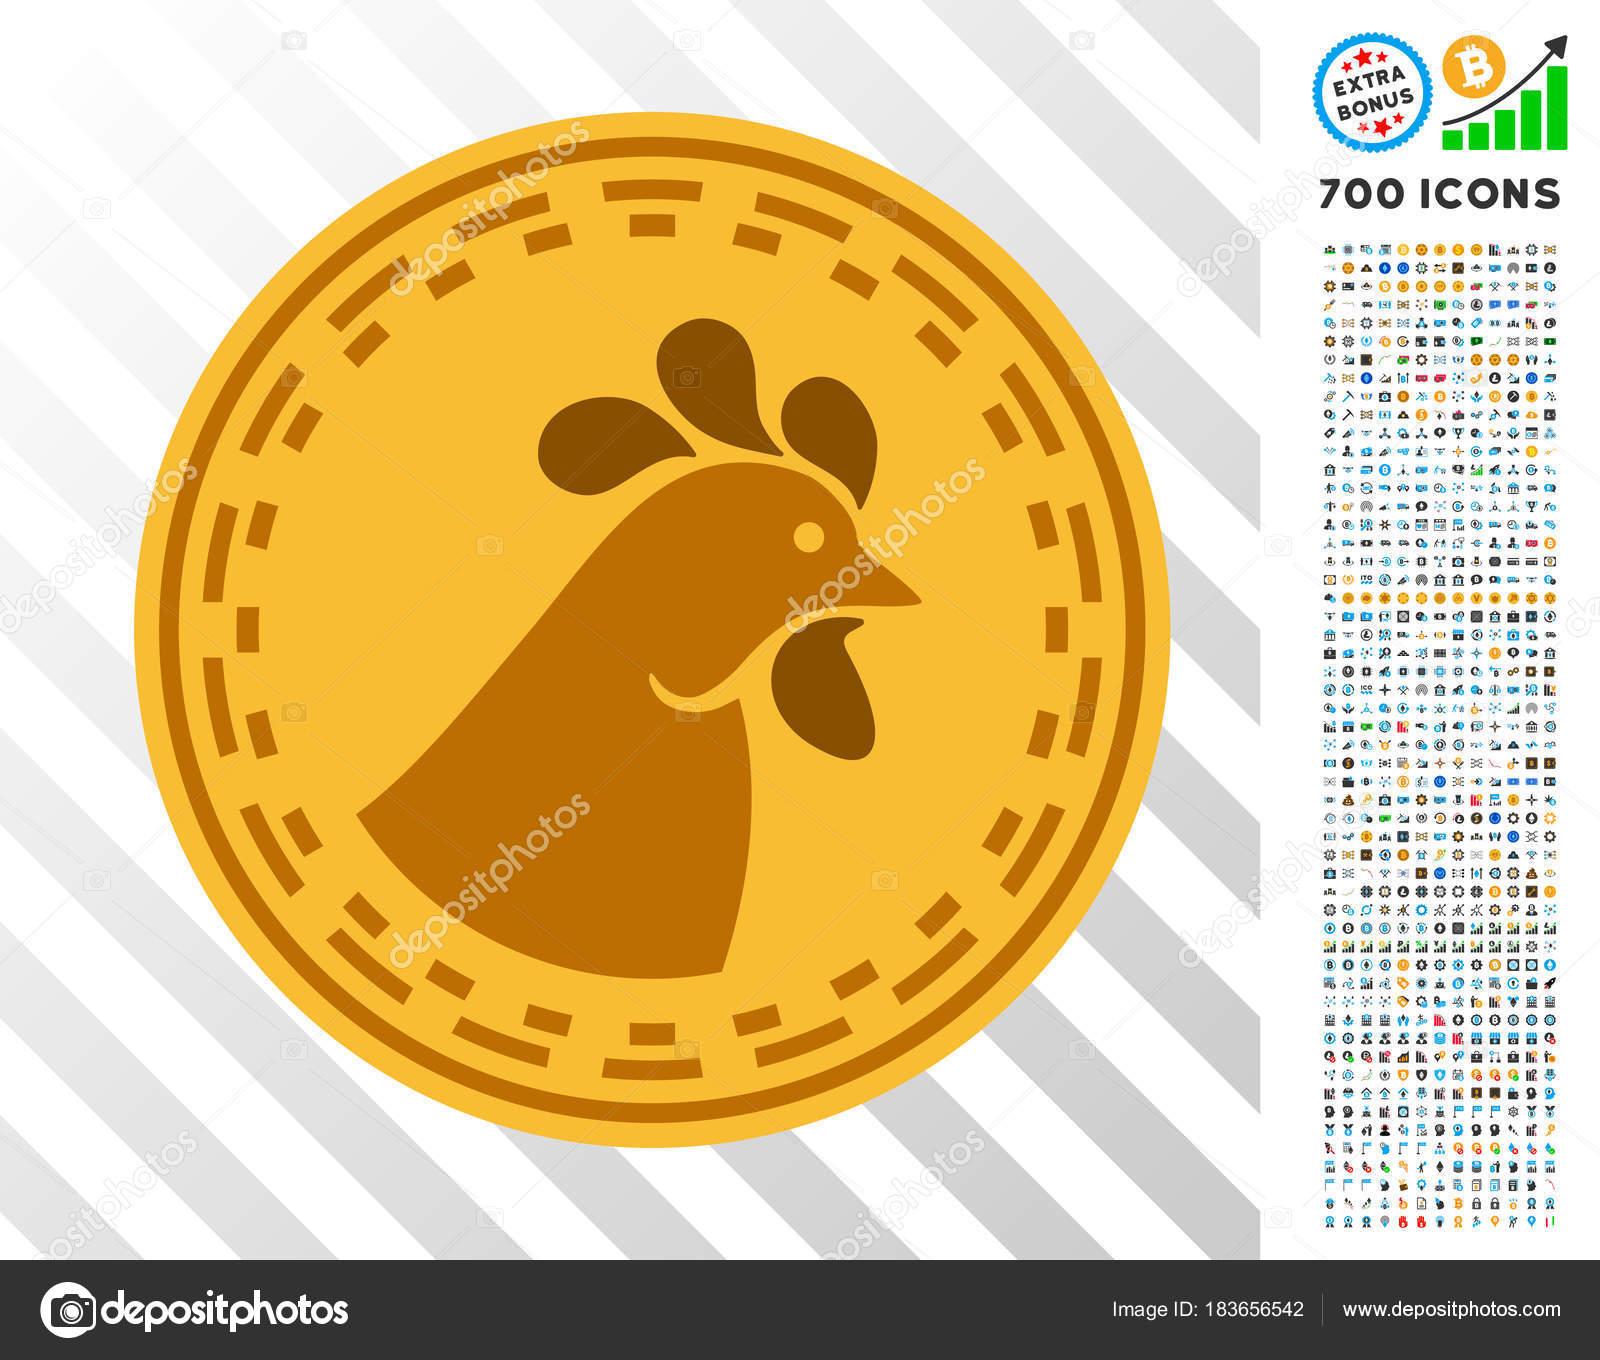 Биткоин курица отзывы index top 20 от forex mmcis group